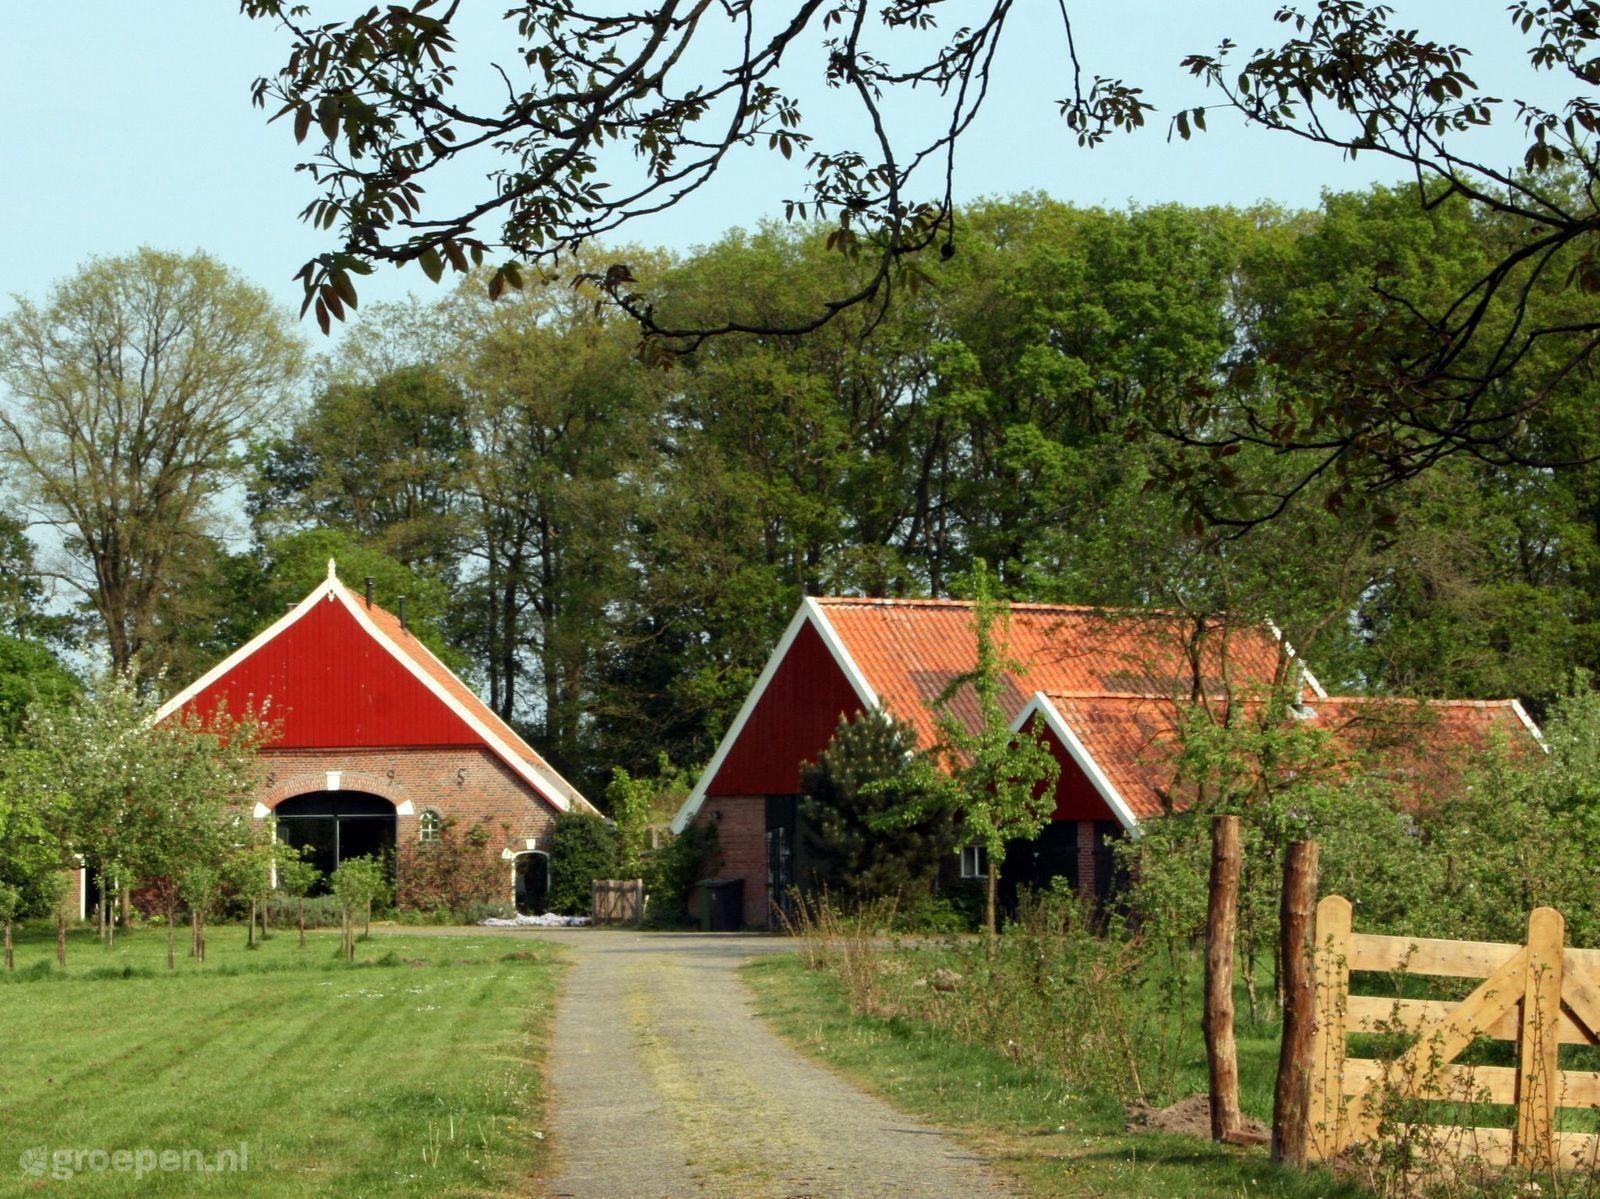 Holiday Farmhouse Winterswijk Woold